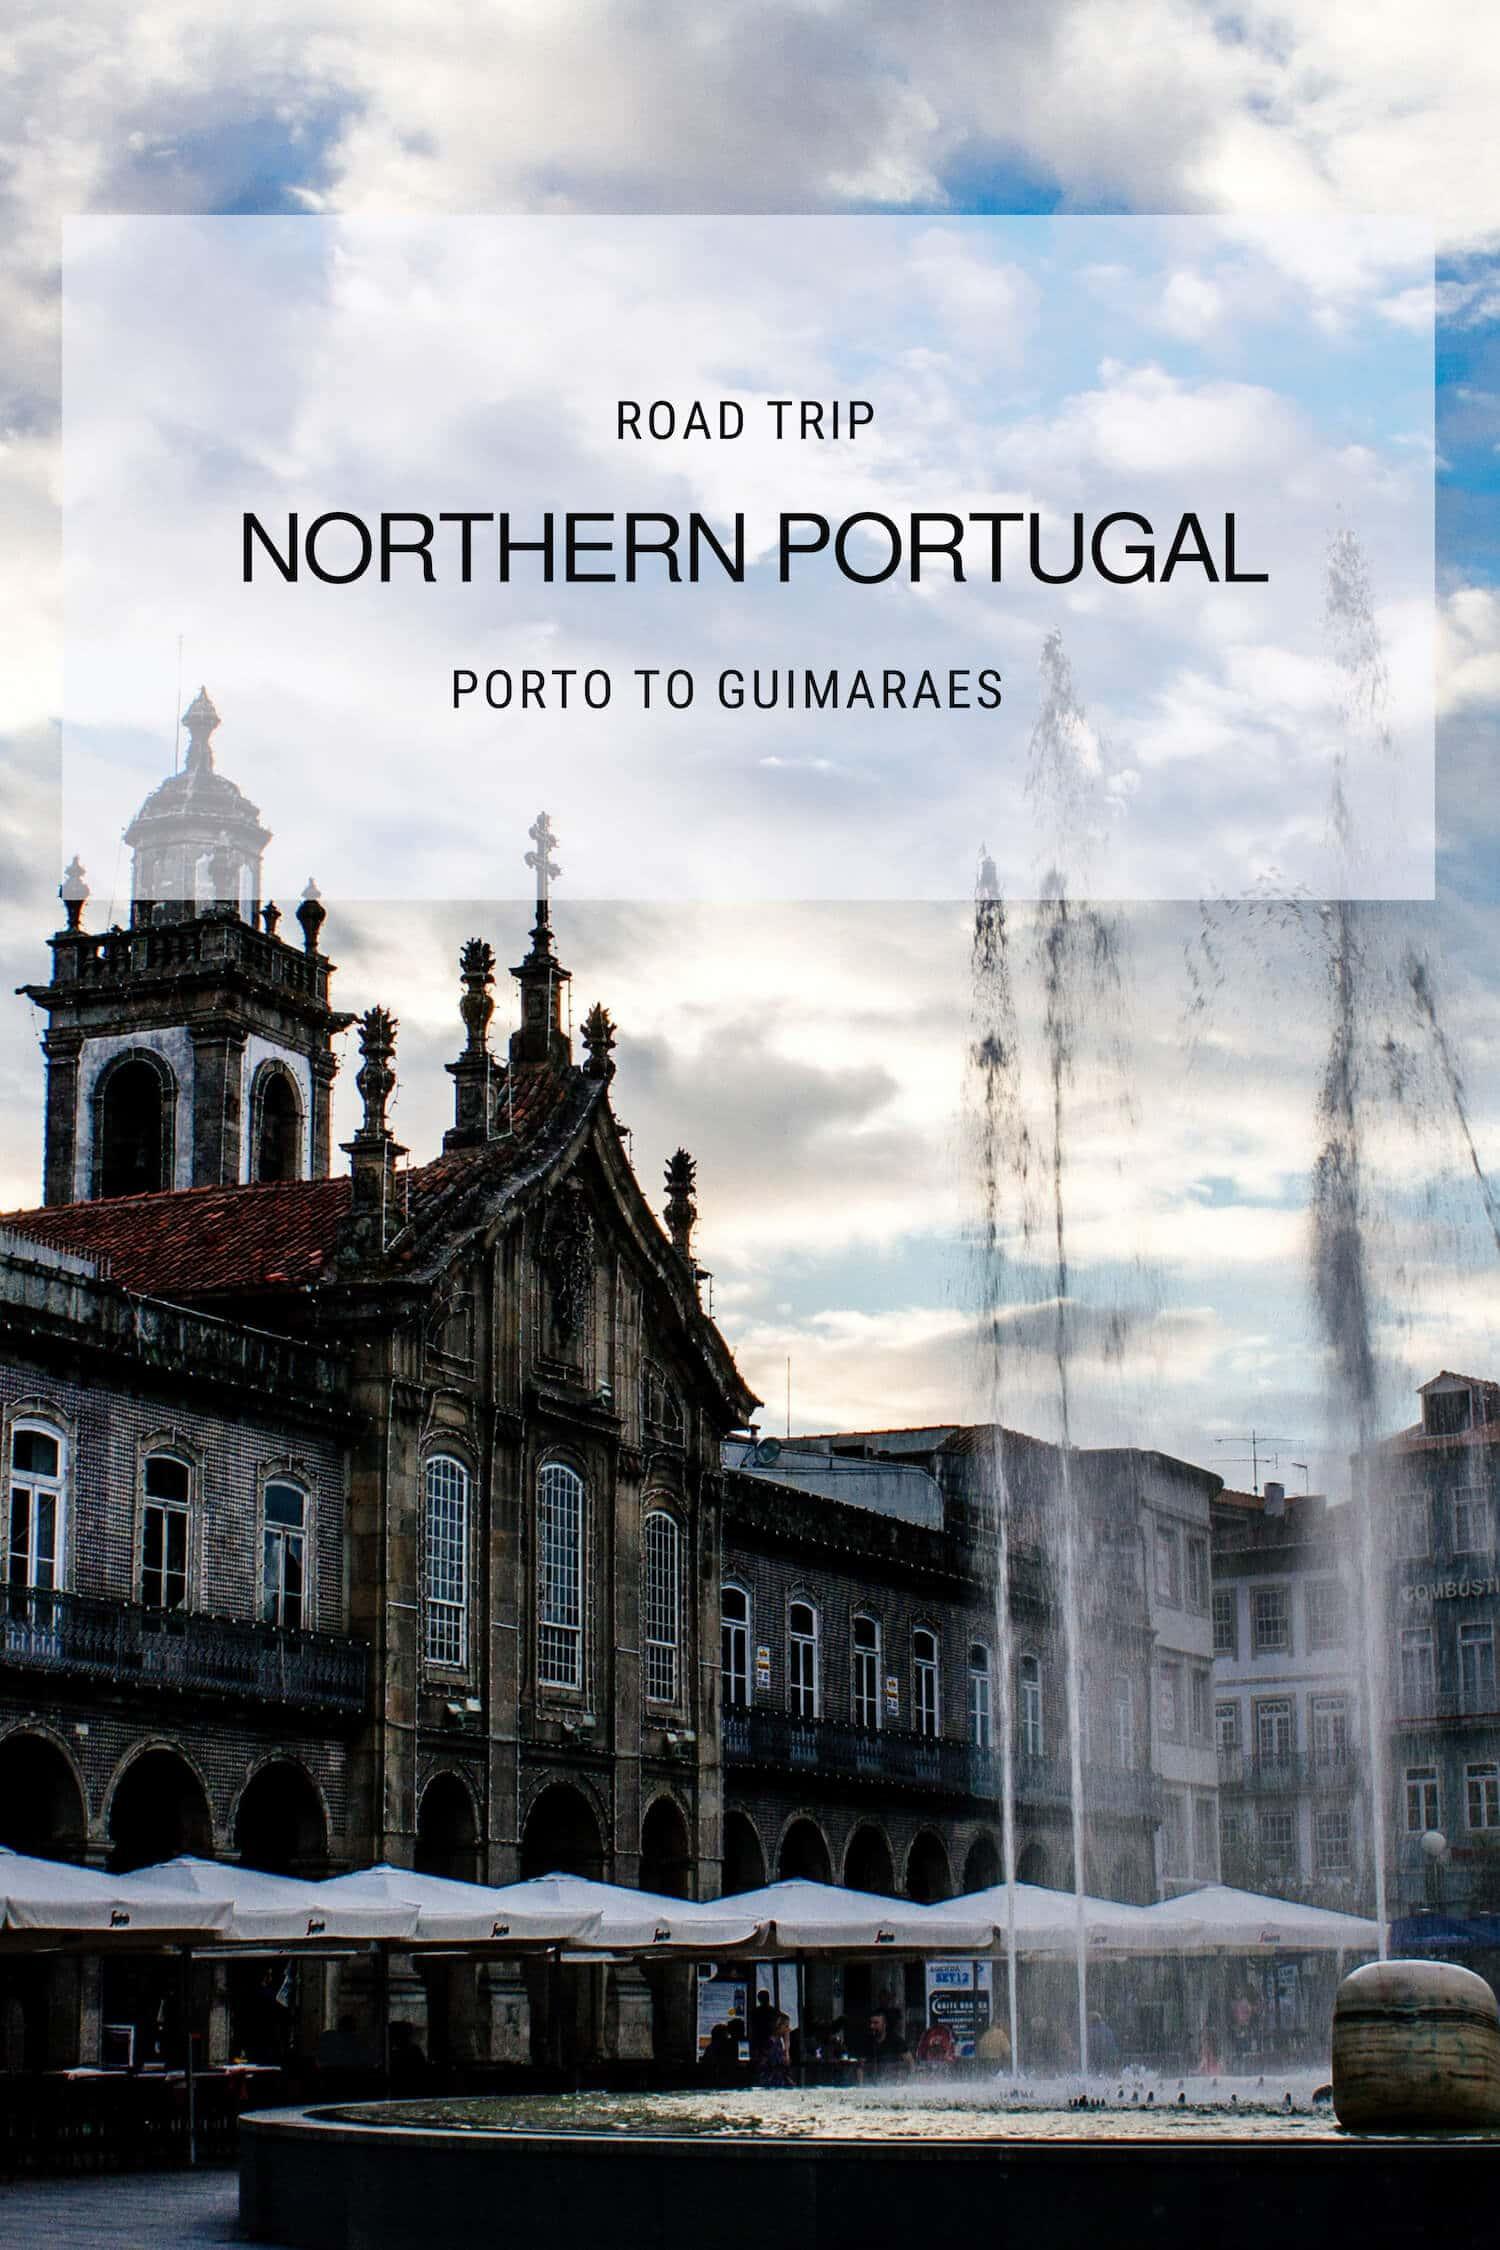 Northern Portugal Road Trip